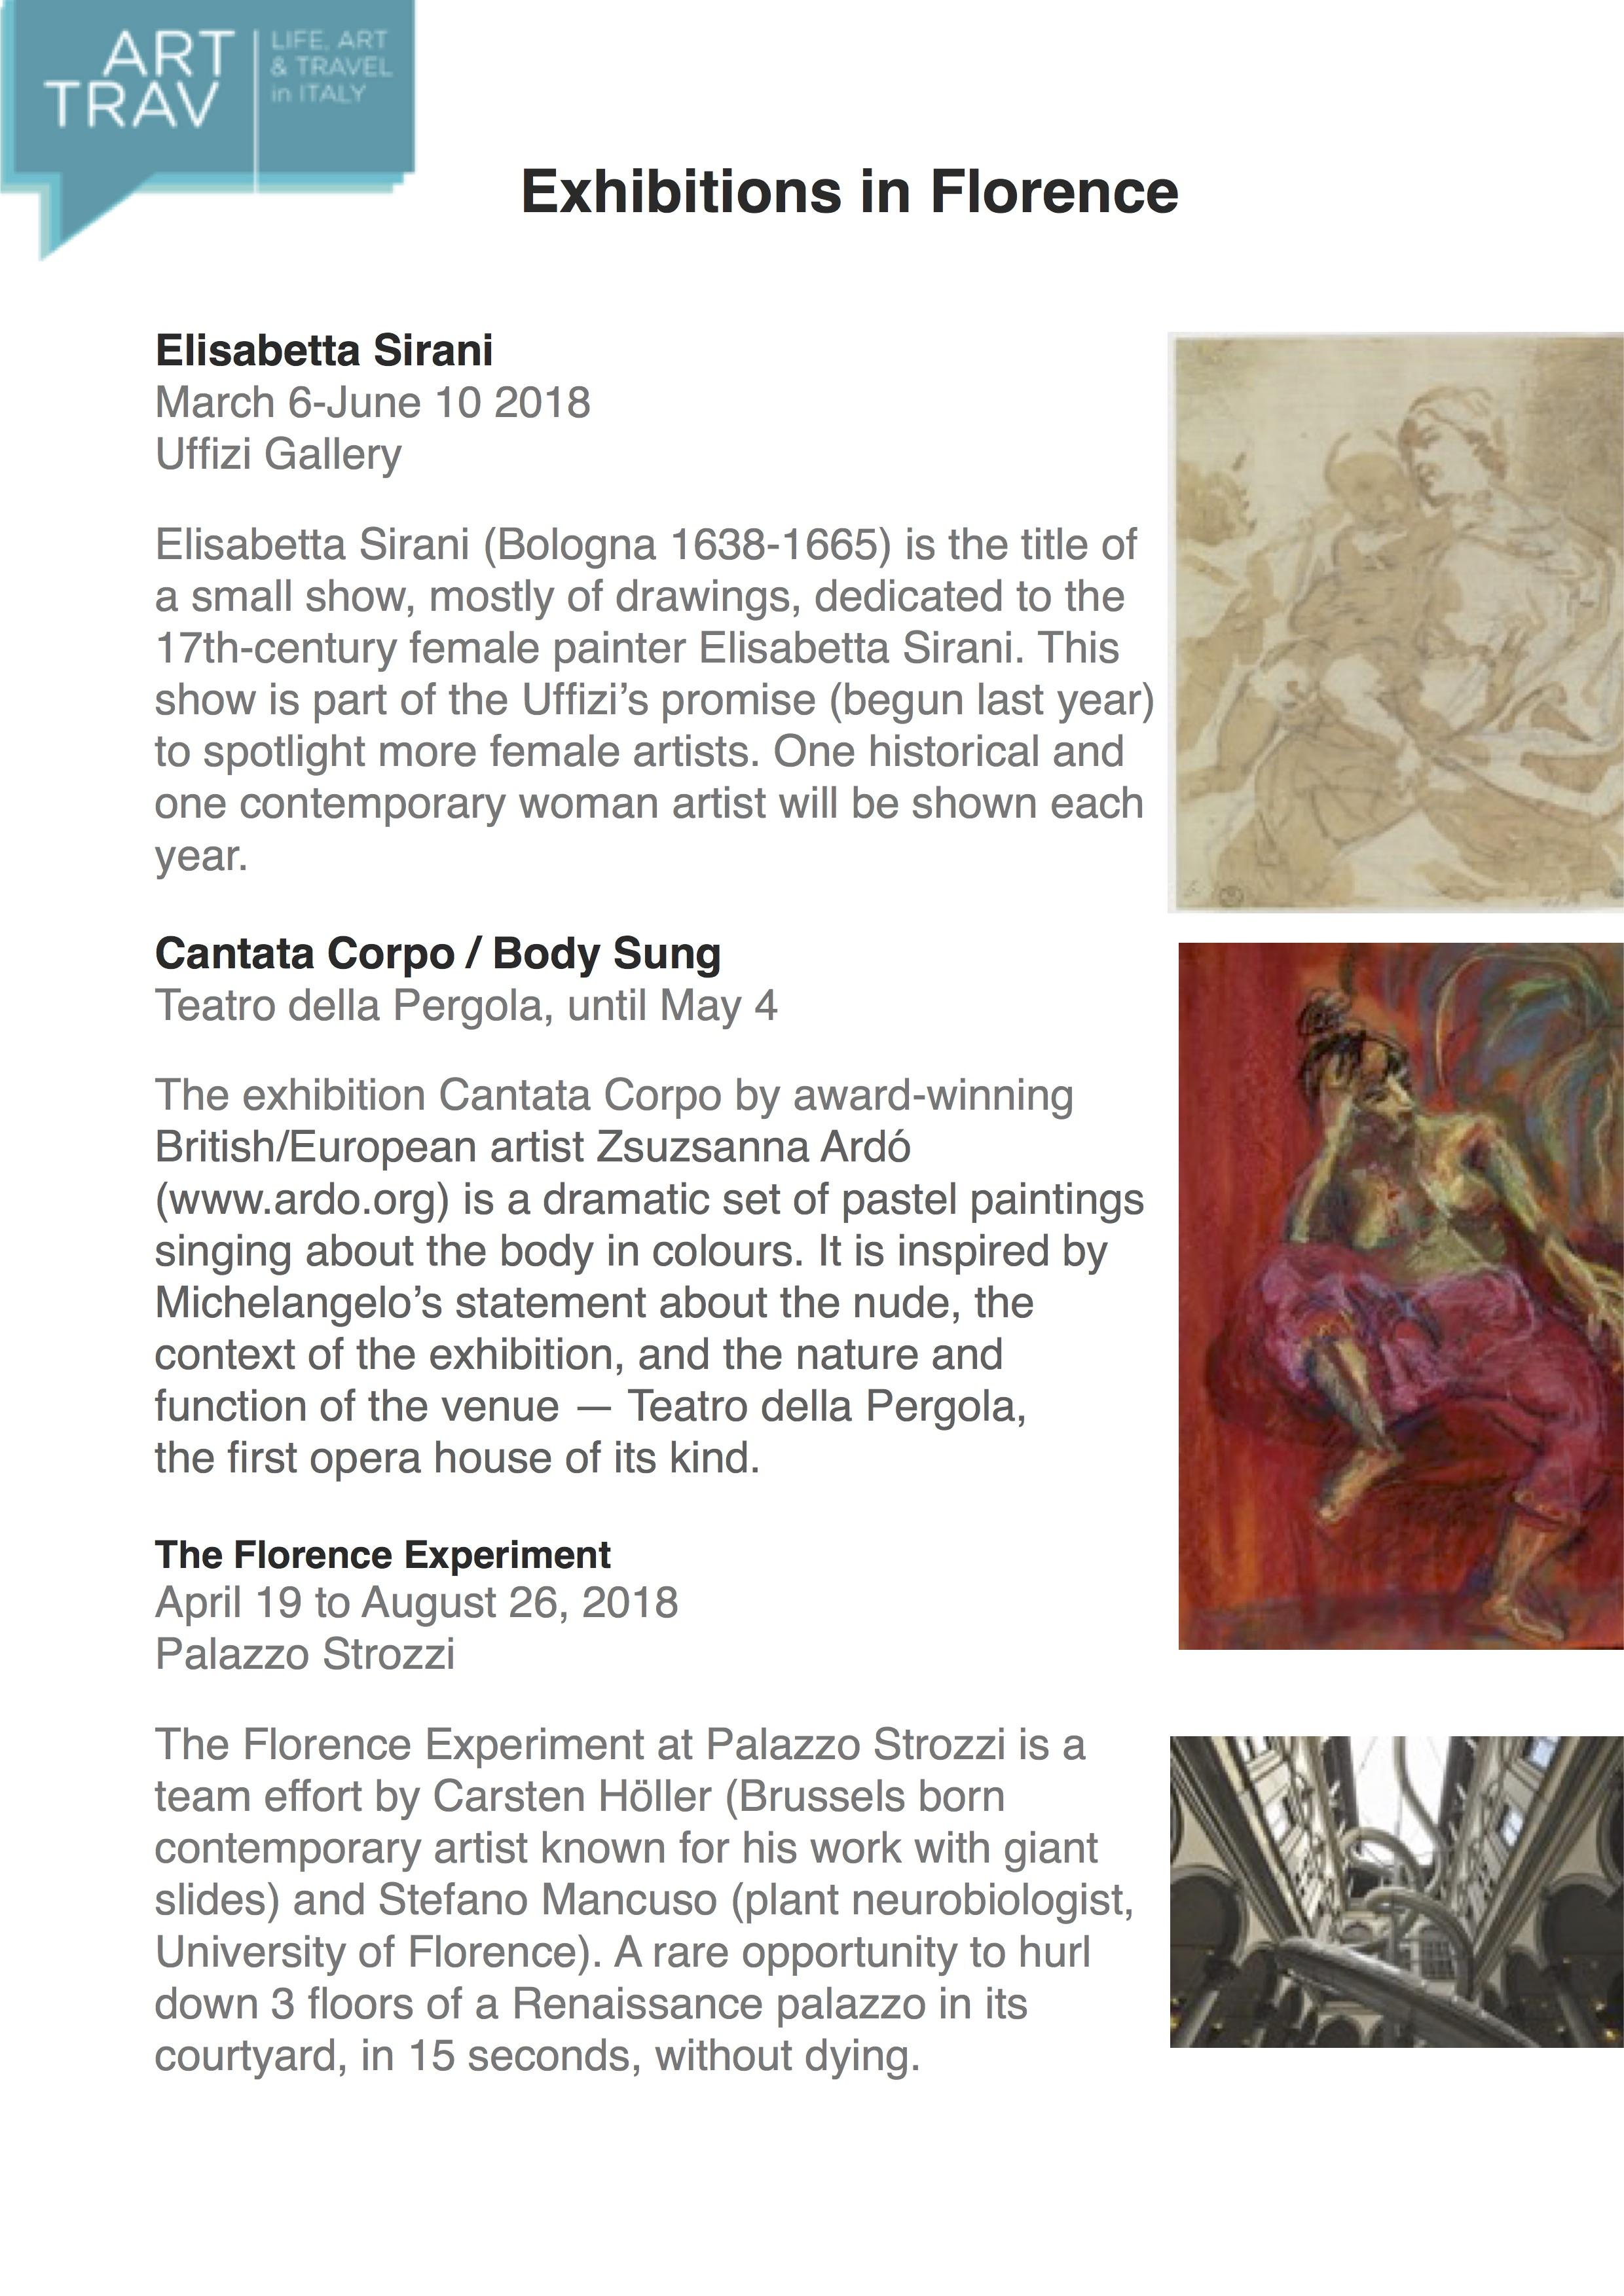 18 IT Flo Arttrav exhibitions Cantata Corpo Ardo.jpg